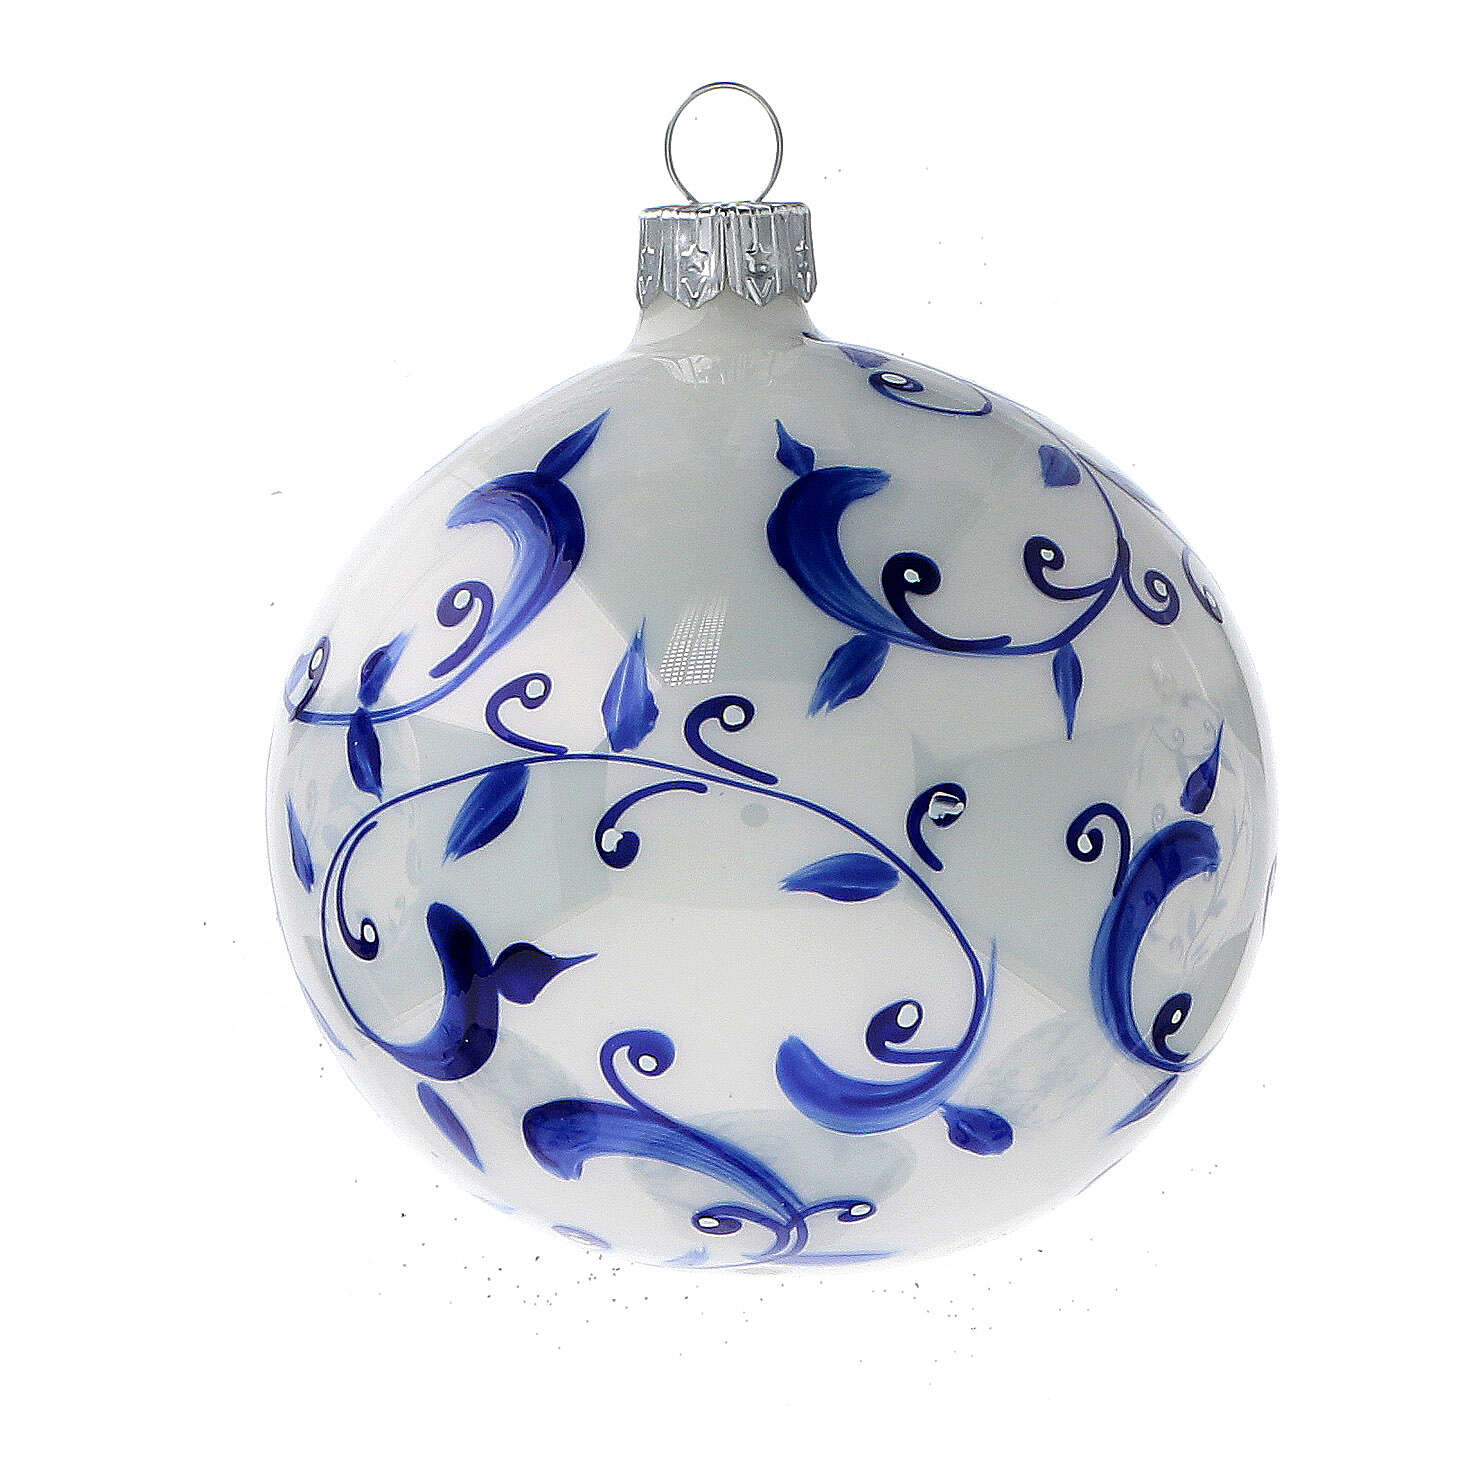 White Christmas balls with blue vines 80 mm 6 pcs 4